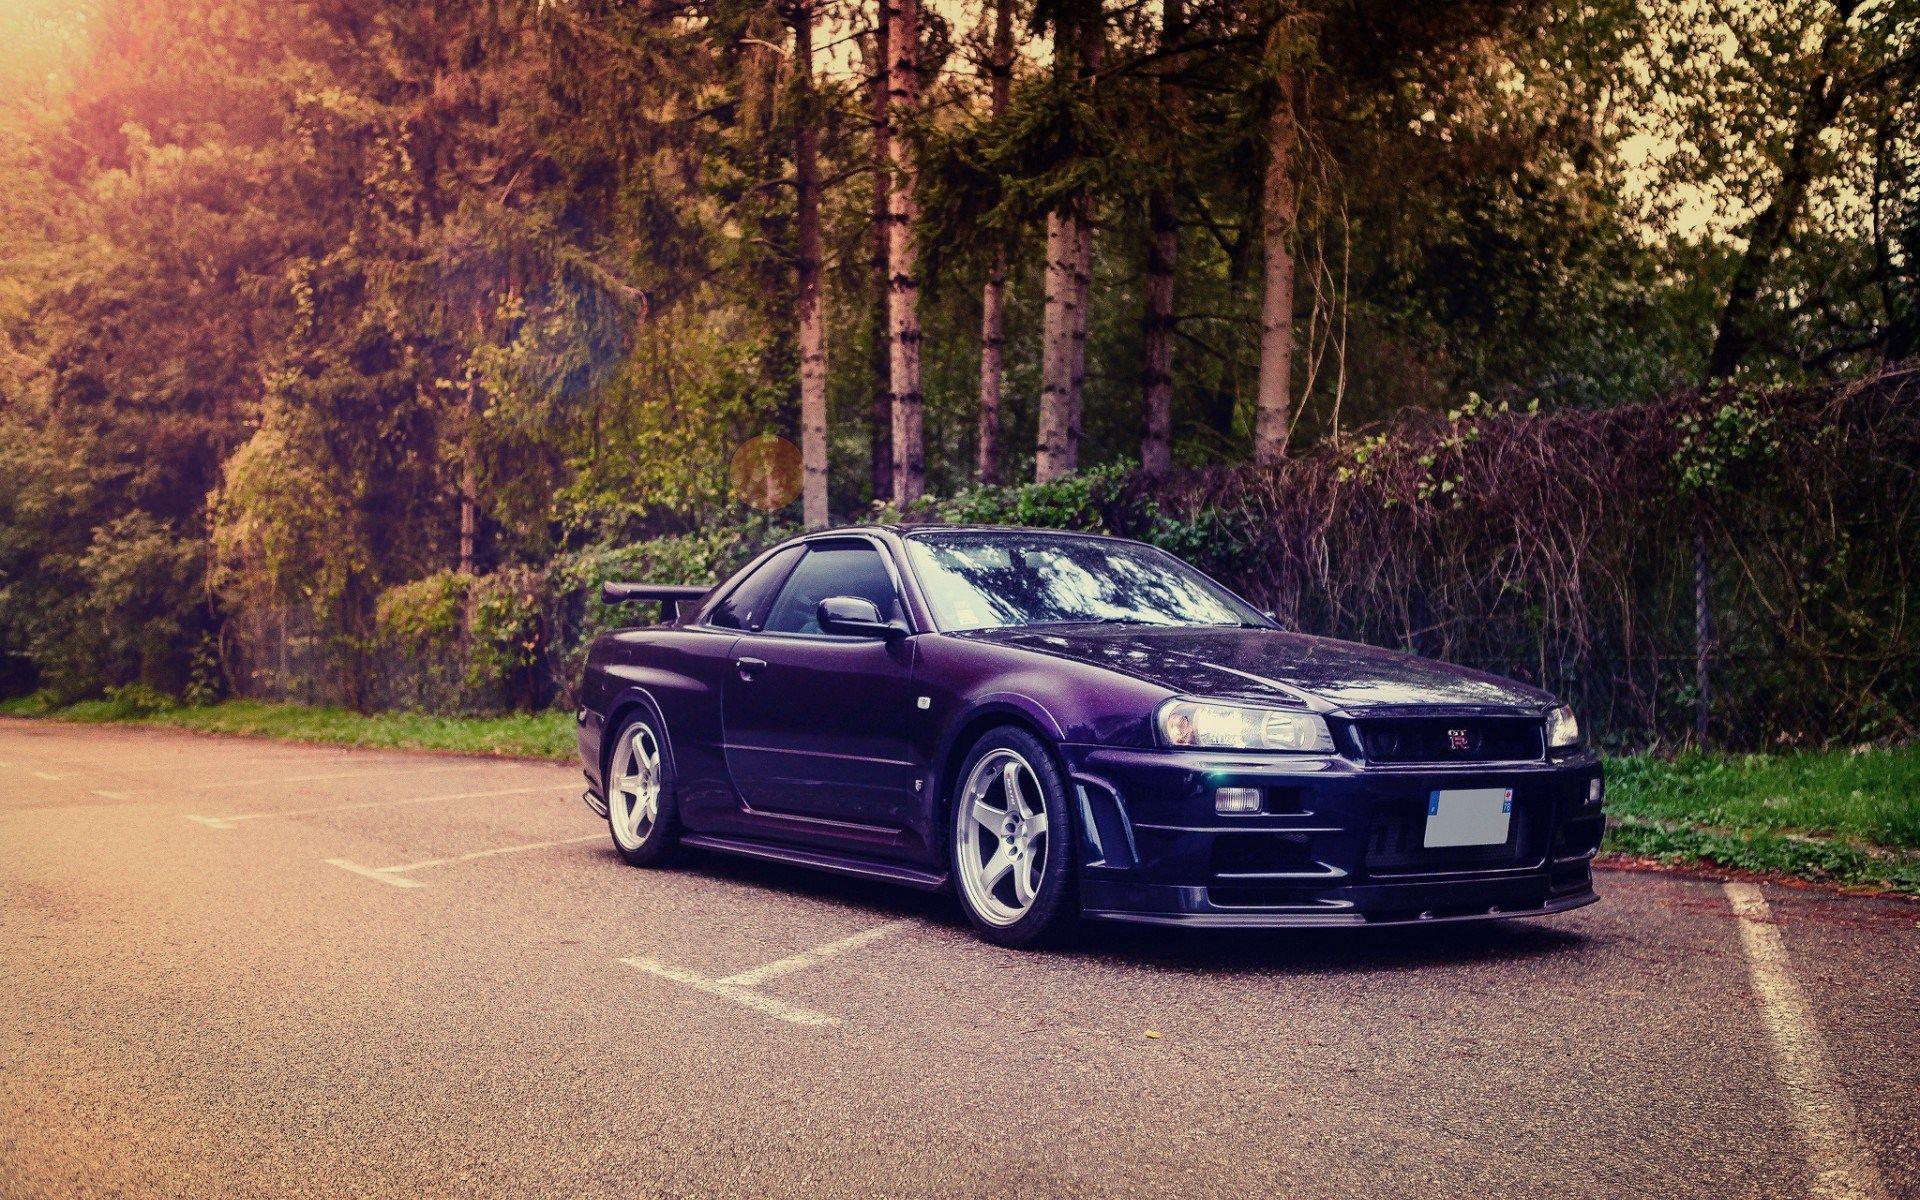 Midnight Purple Nissan Skyline R34 GTR Nissan gtr